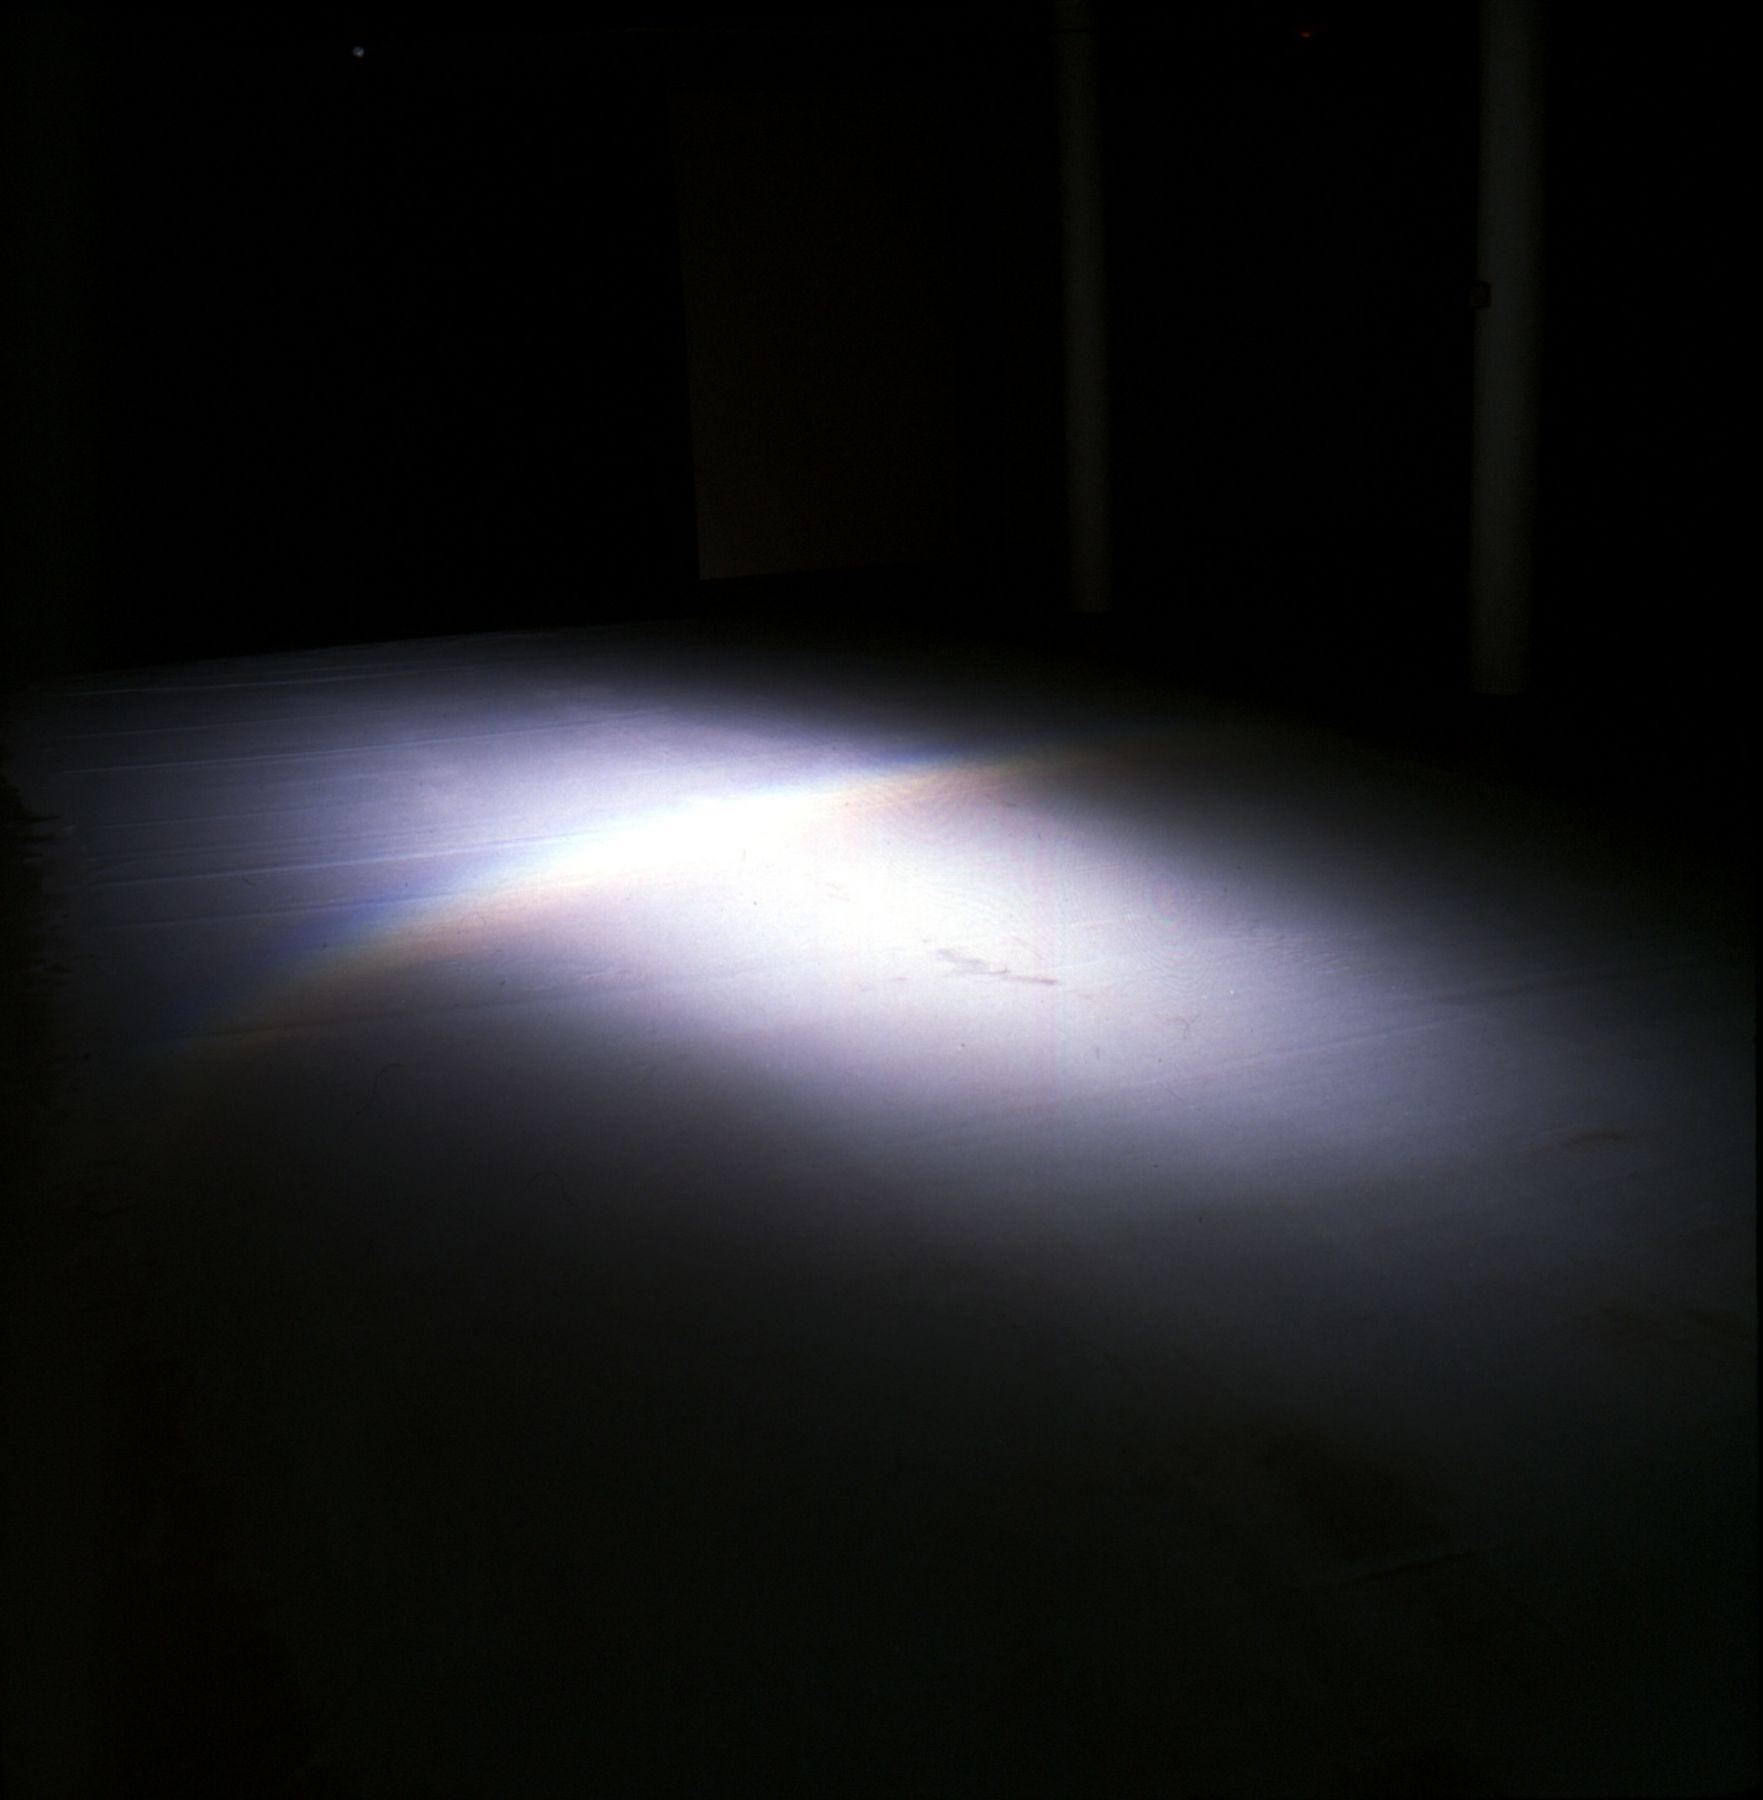 Chasing Rainbows, 1998